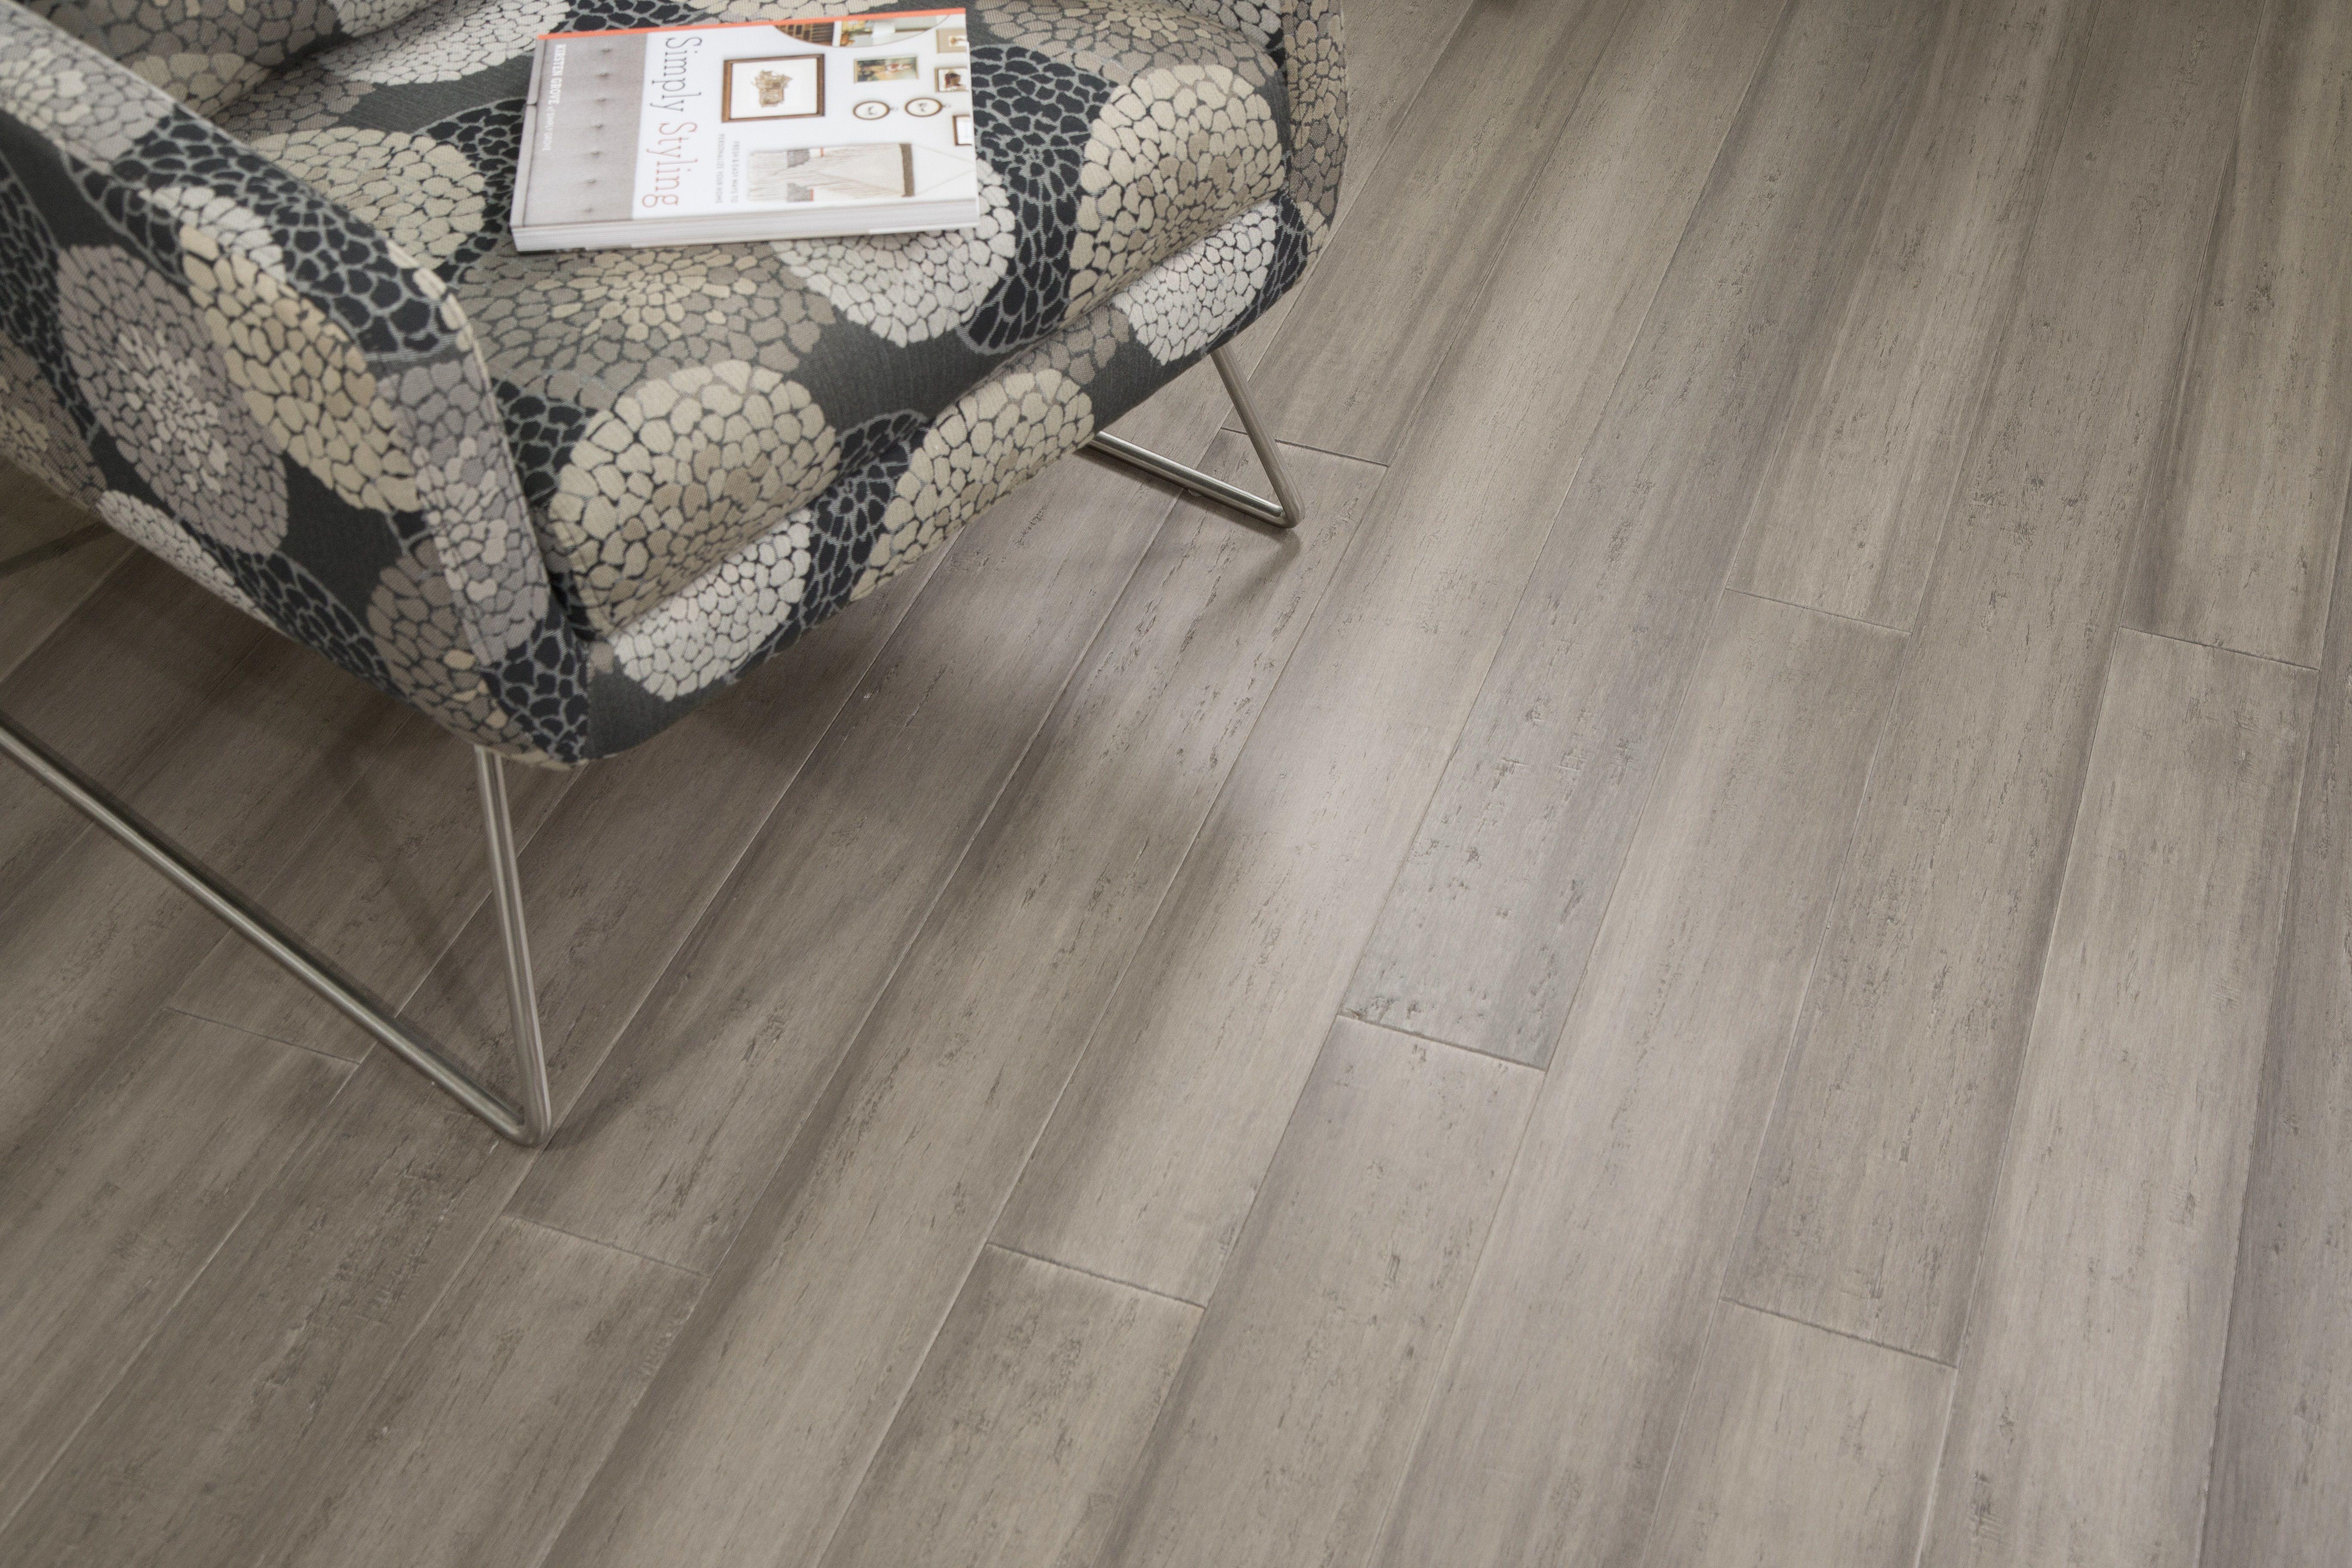 Engineered Hardwood Bamboo Flooring, 5 Star Reviews